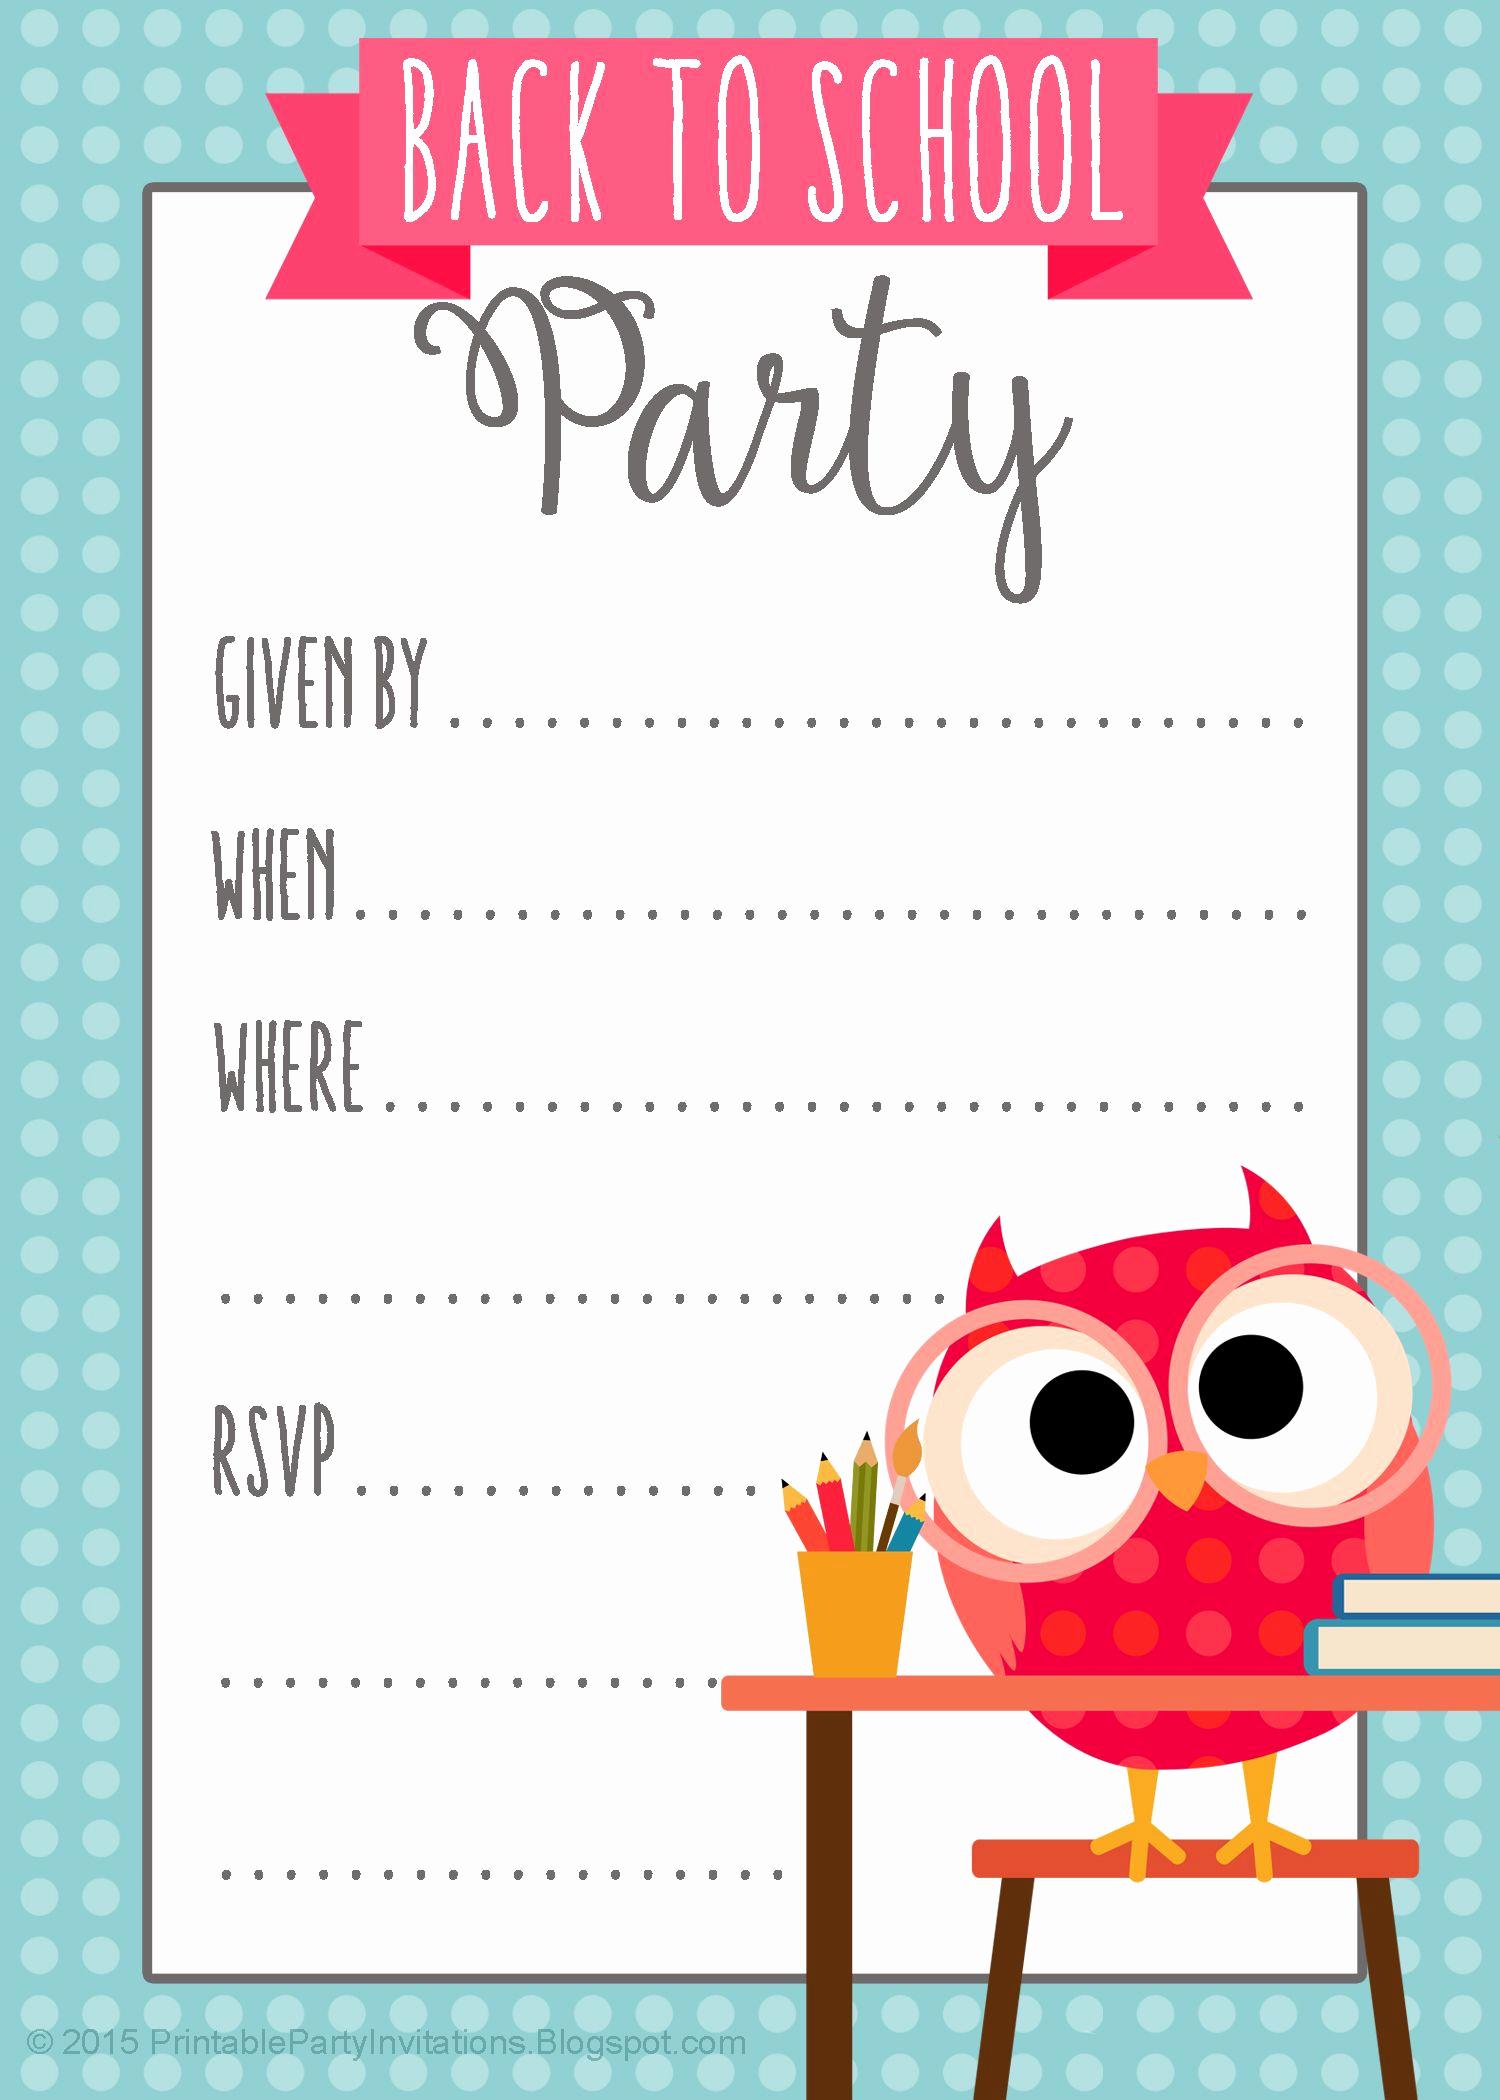 Back to School Invitation Inspirational Free Printable Back to School Party Invitation